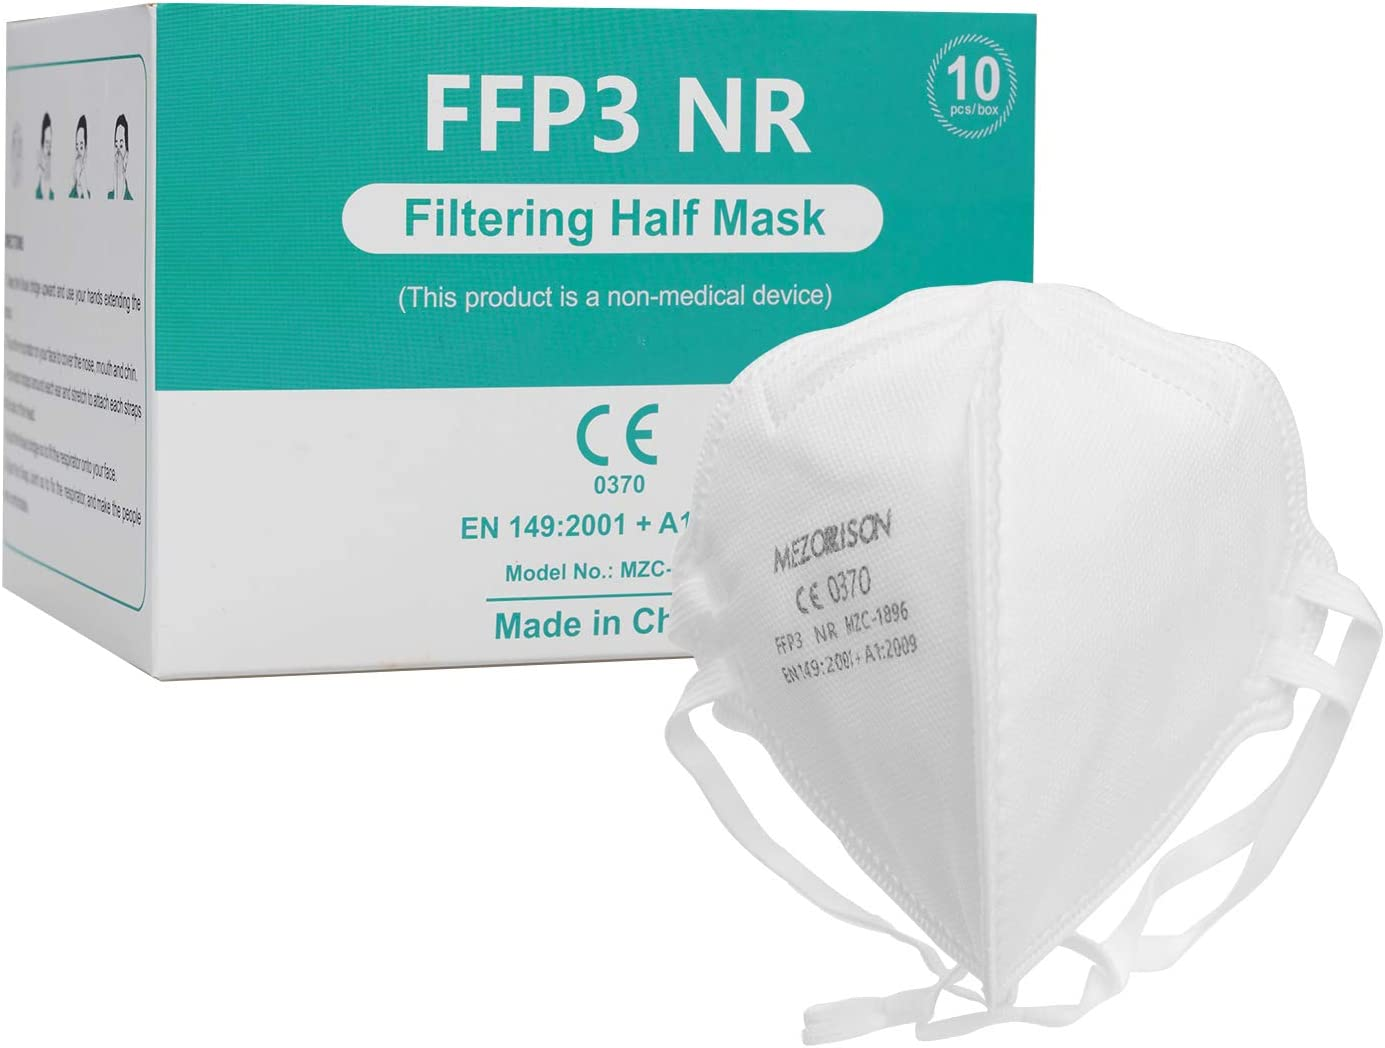 Mascarillas de respiración FFP3 con Válvula de Aire -10Pcs, Mascarillas Desechables 149: 2001 + A1: 2009, Mascarilla Protectora Respiratoria Multicapa con Alta Capacidad de Filtración